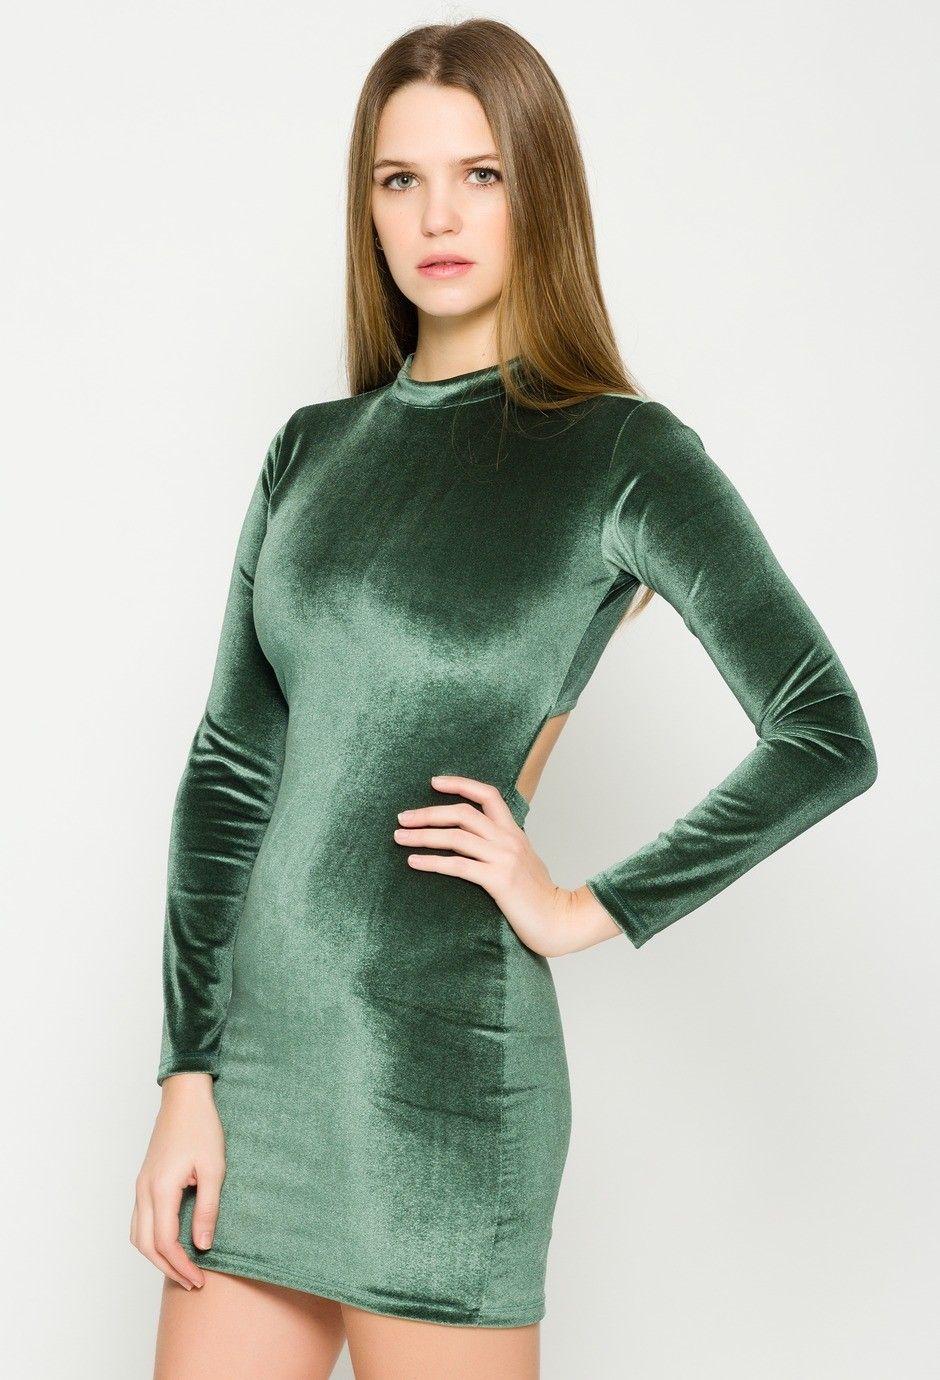 Fiesta VerdeParty Fashion Vestido DressesDresses Apolo b6fy7Yg